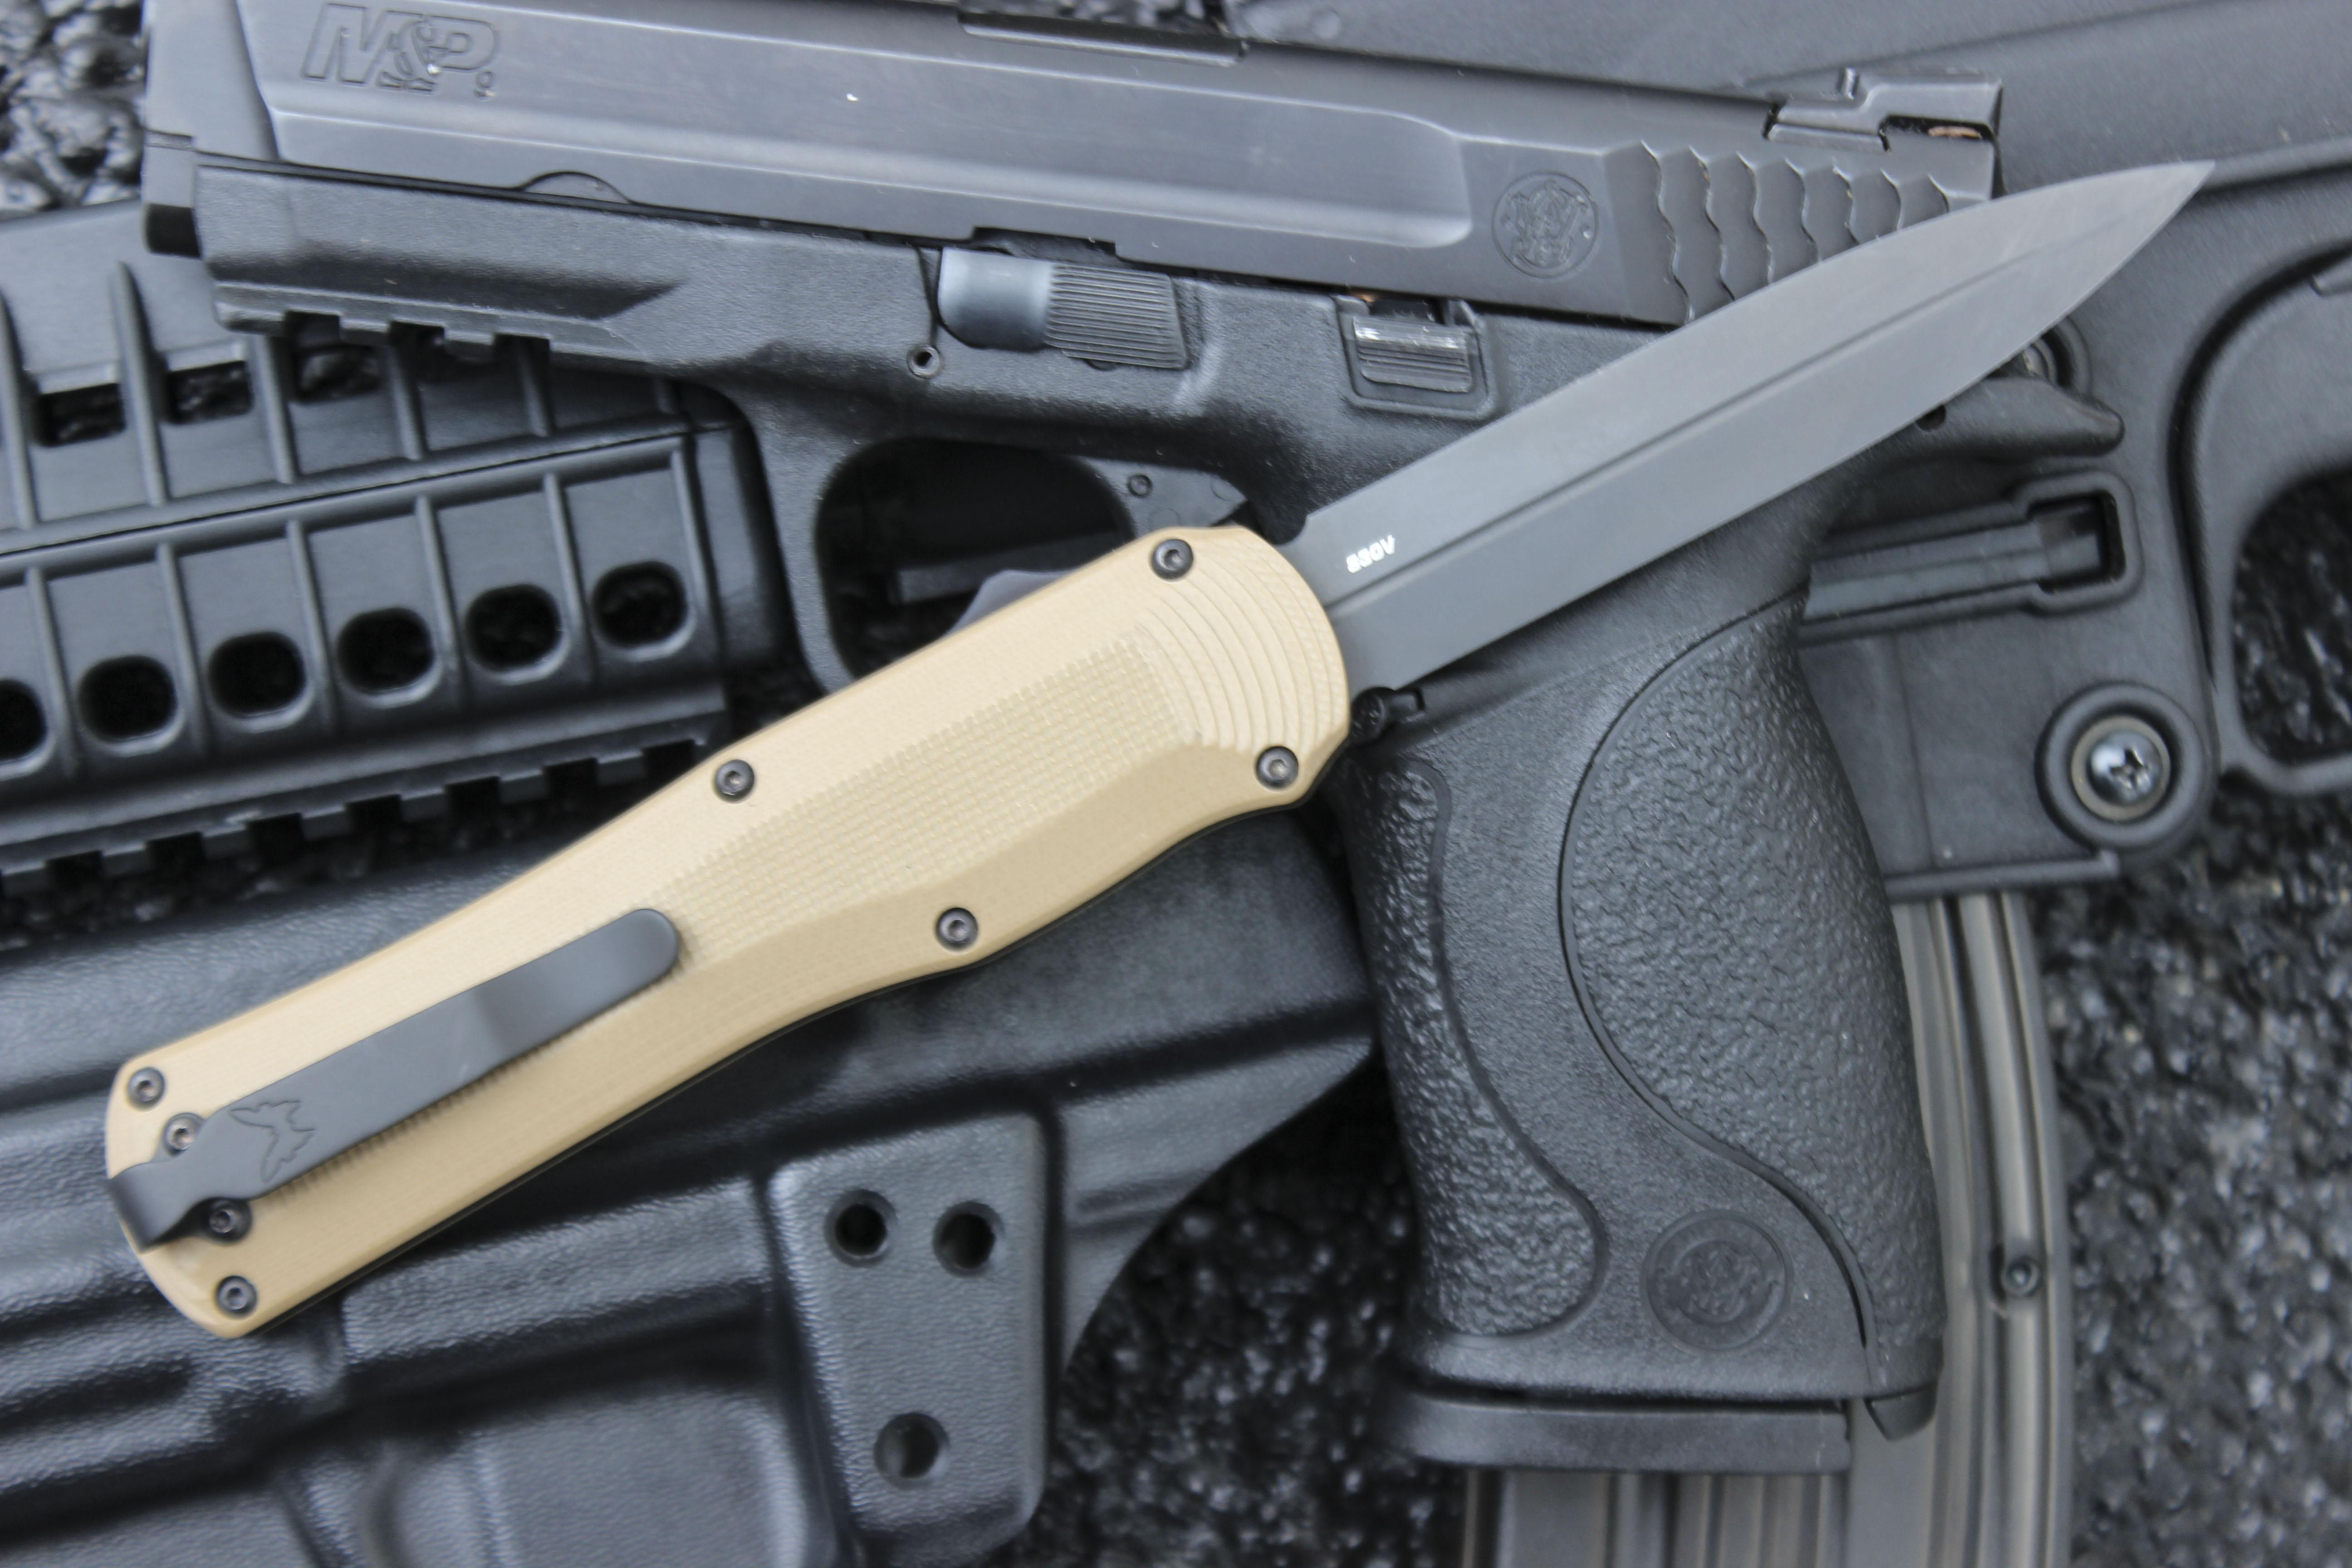 Benchmade Autocrat OTF EDC knife